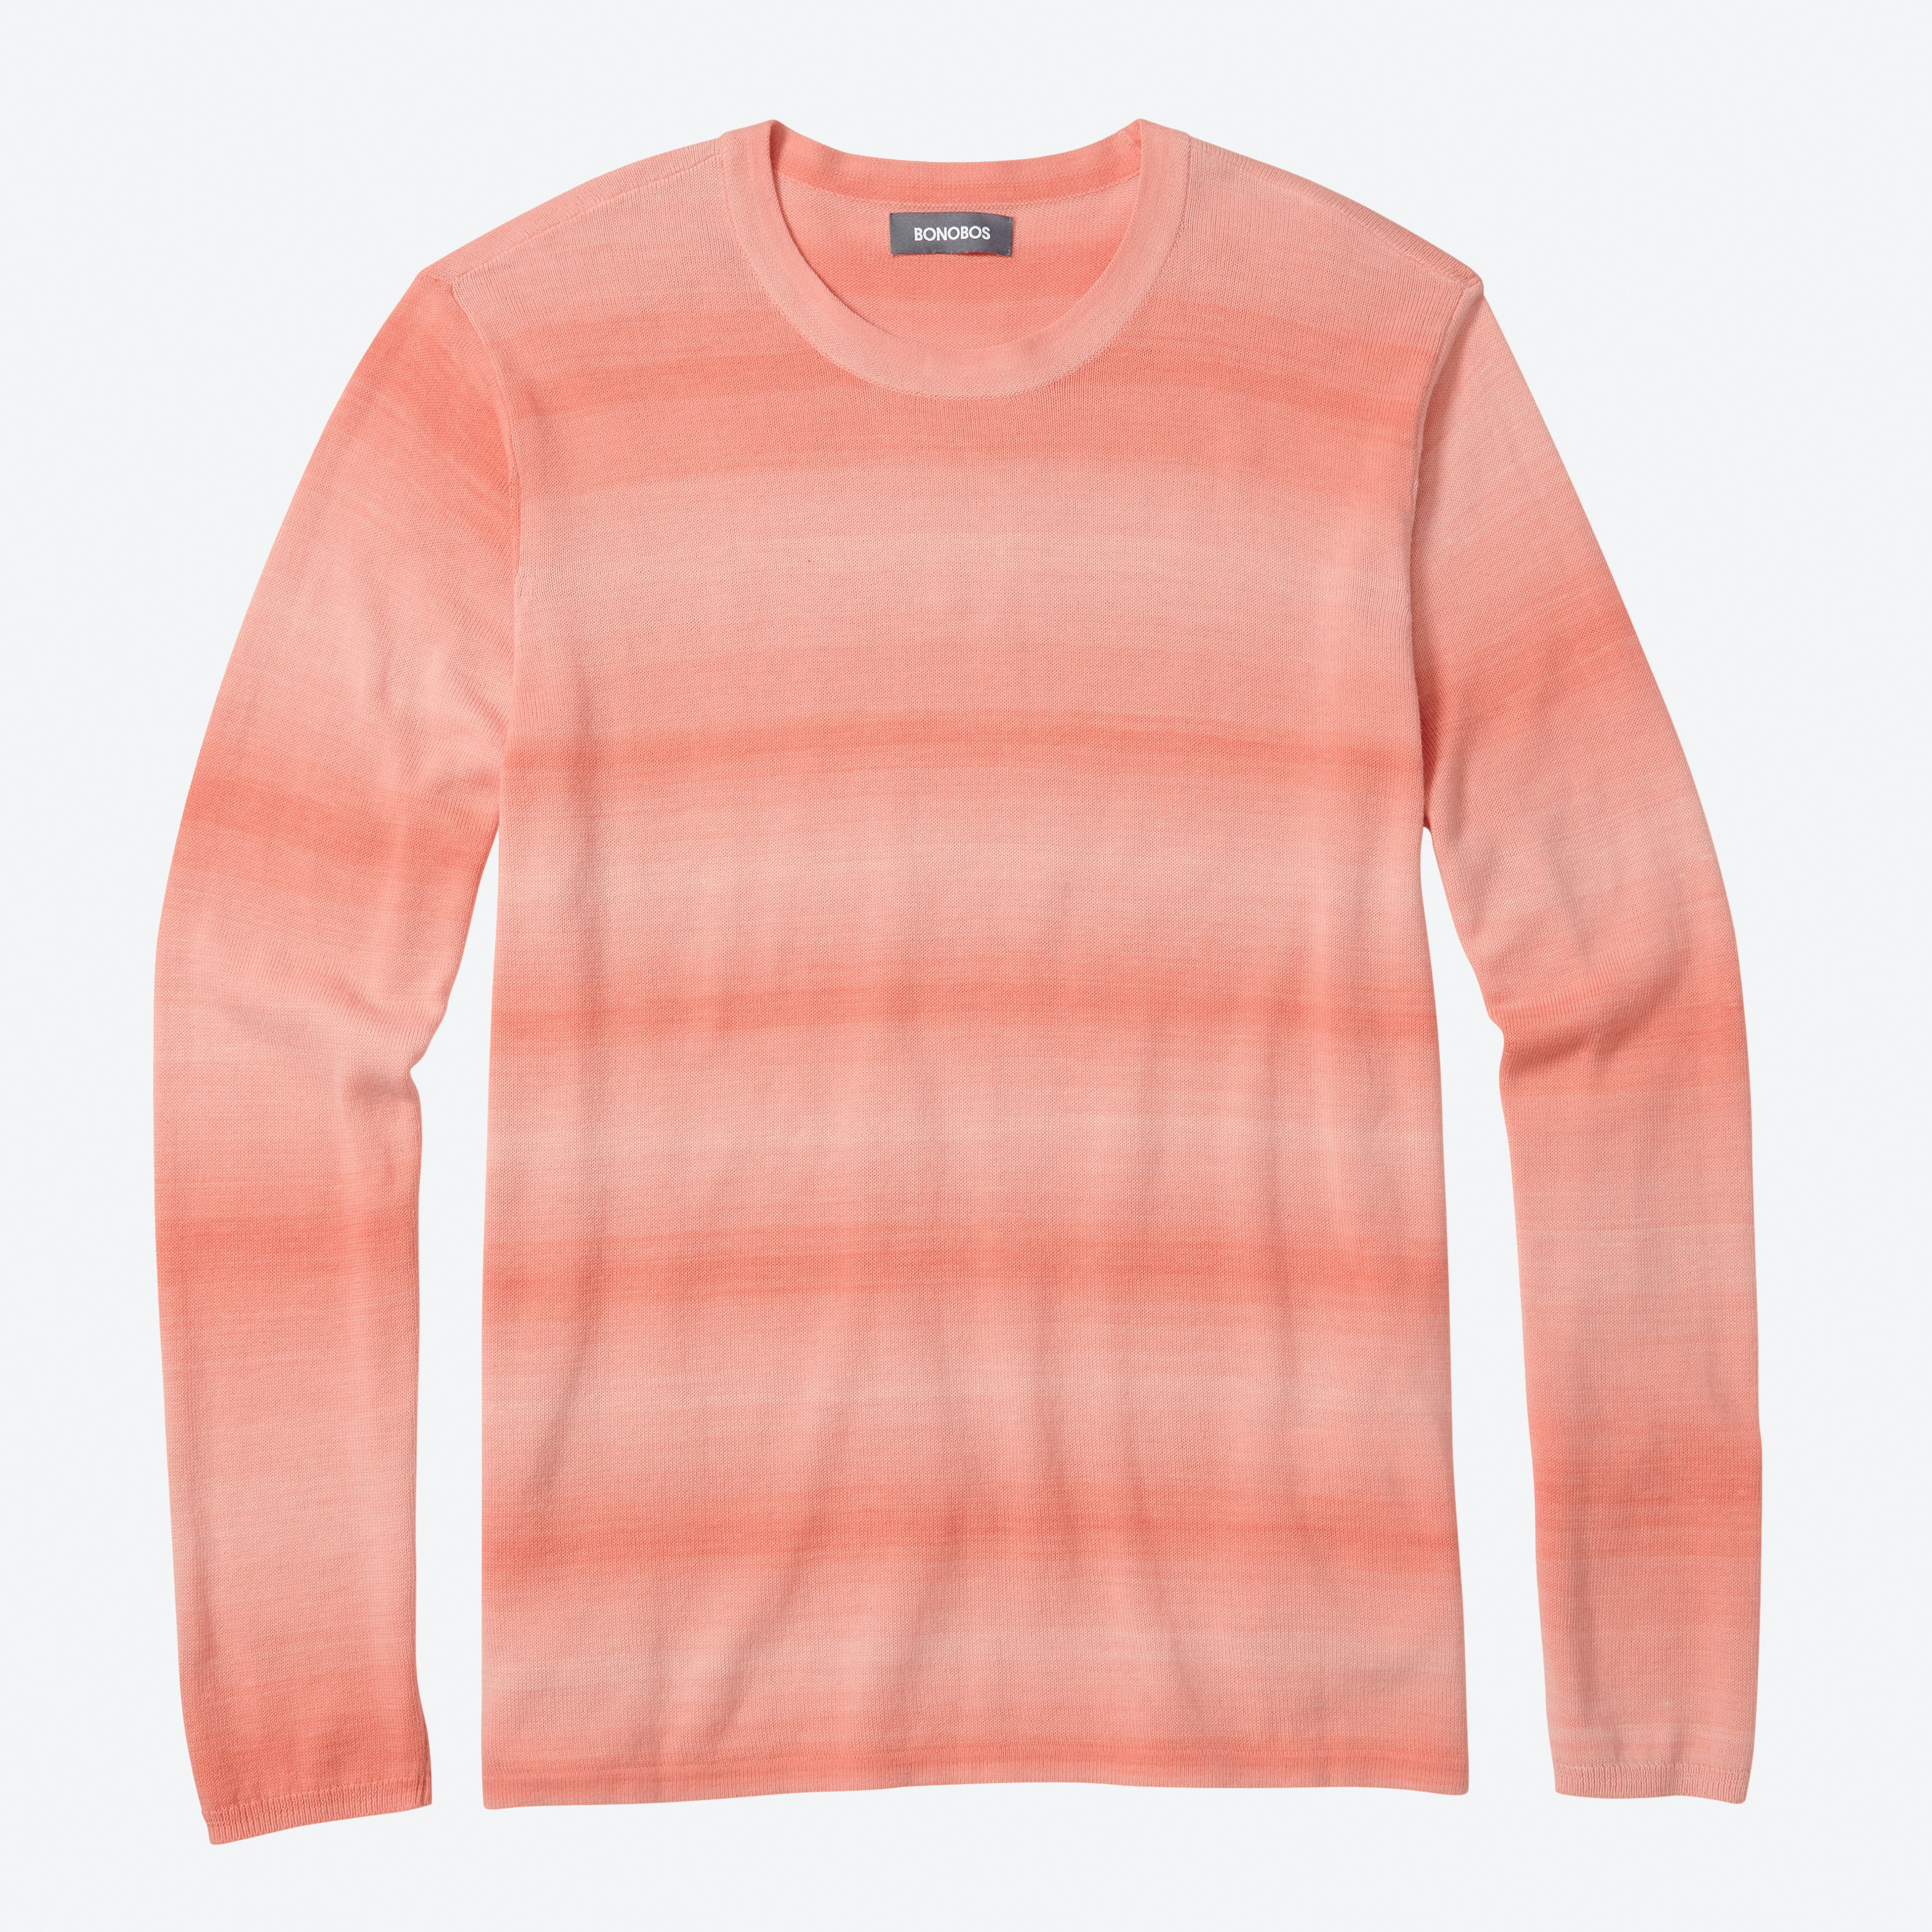 Ombre Cotton Crew Neck Sweater